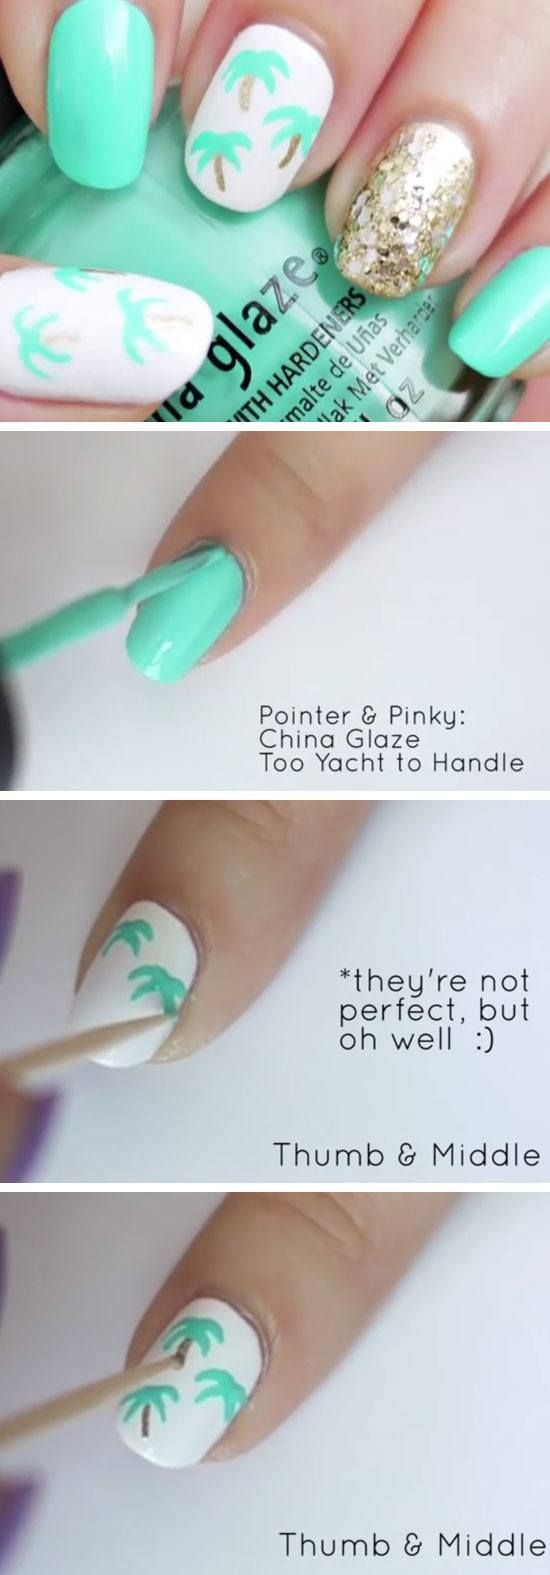 Best 20+ Nail ideas for summer ideas on Pinterest | Summer ...